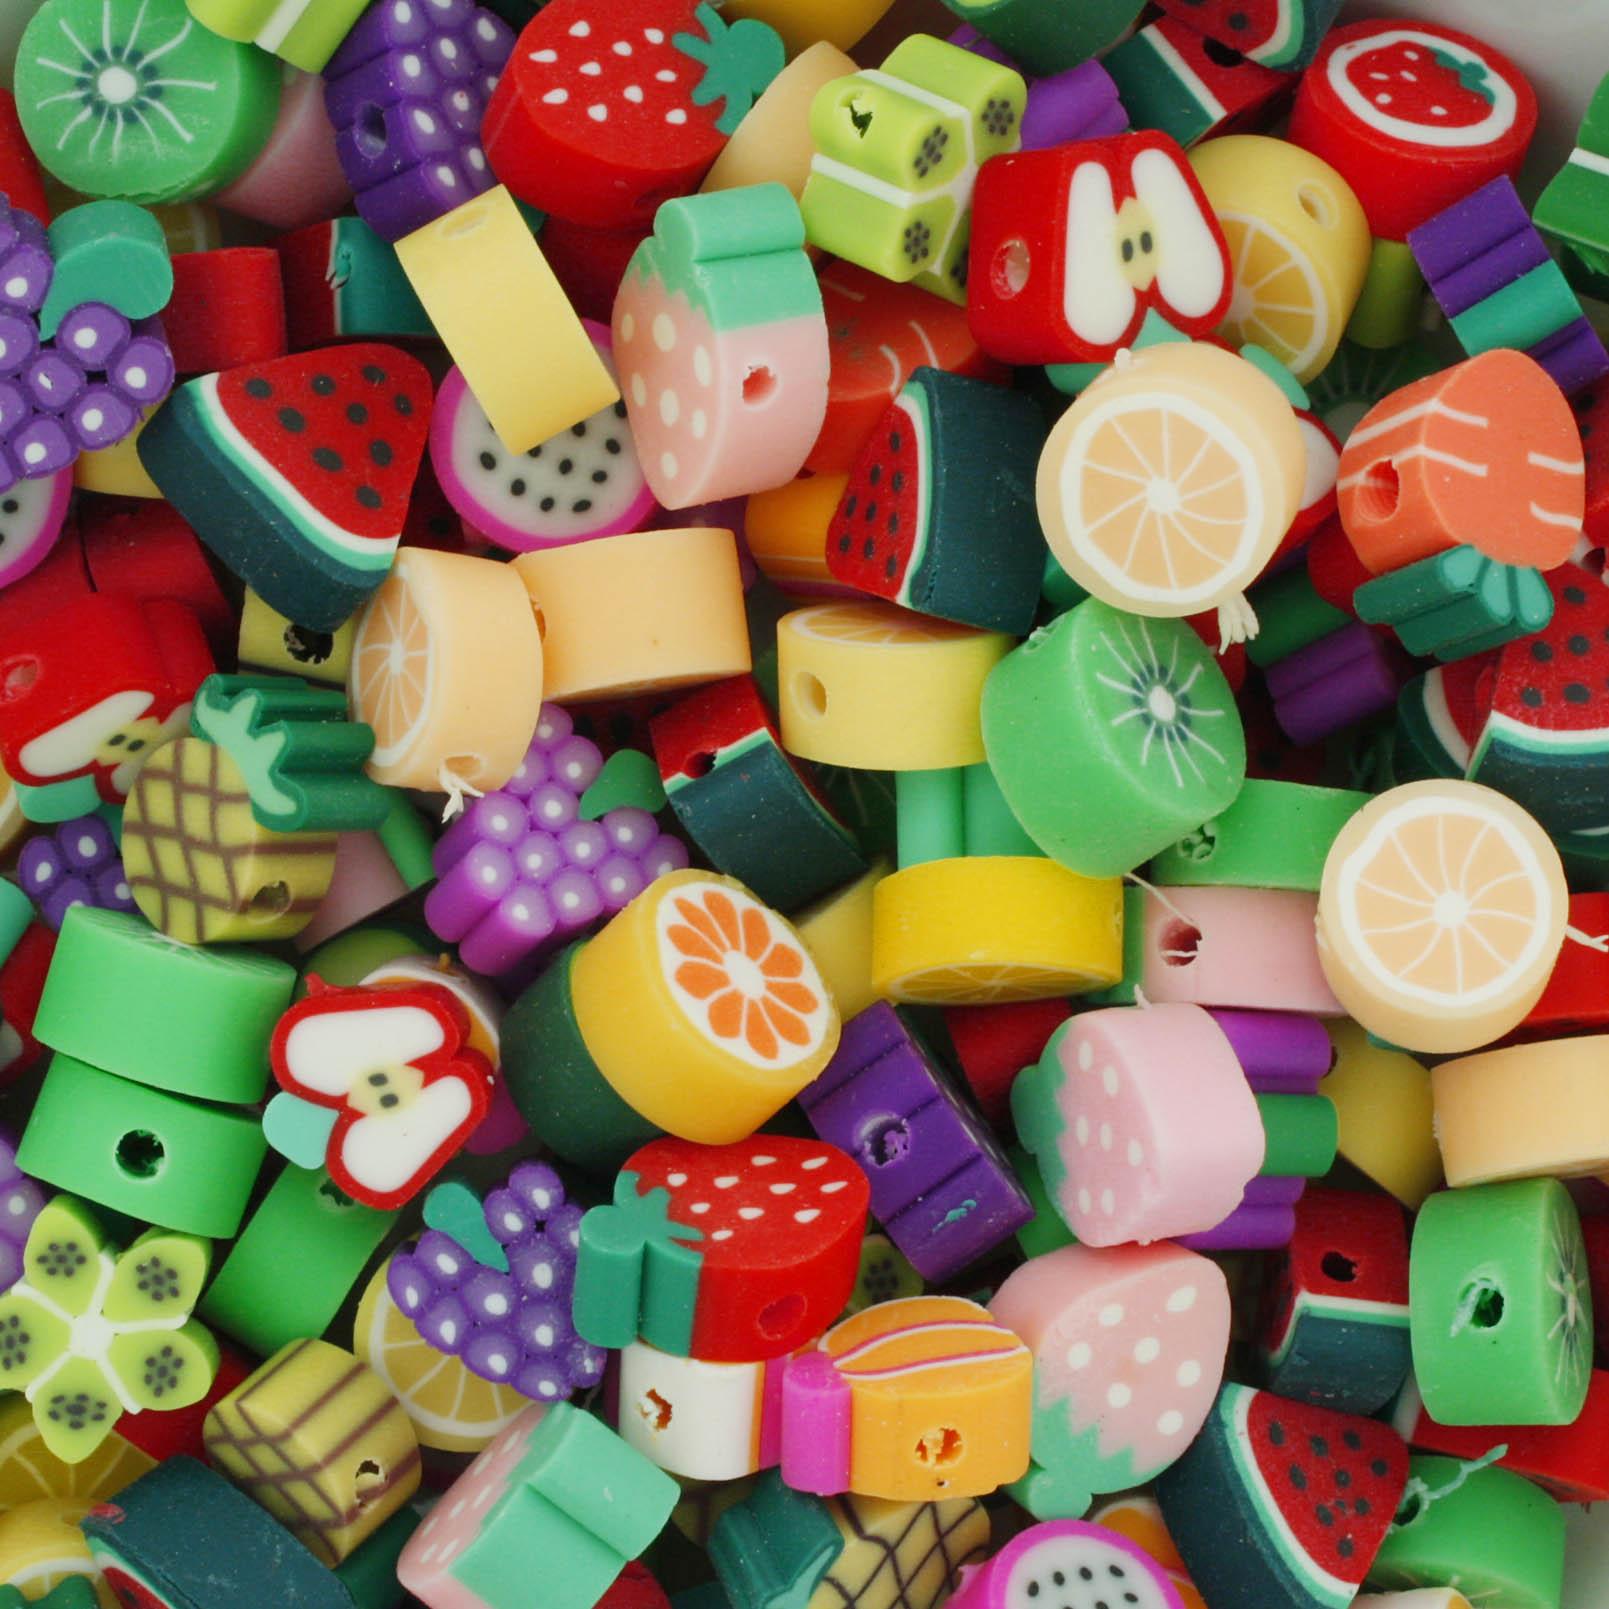 Miçanga Infantil - Borracha - Frutinhas  - Stéphanie Bijoux® - Peças para Bijuterias e Artesanato